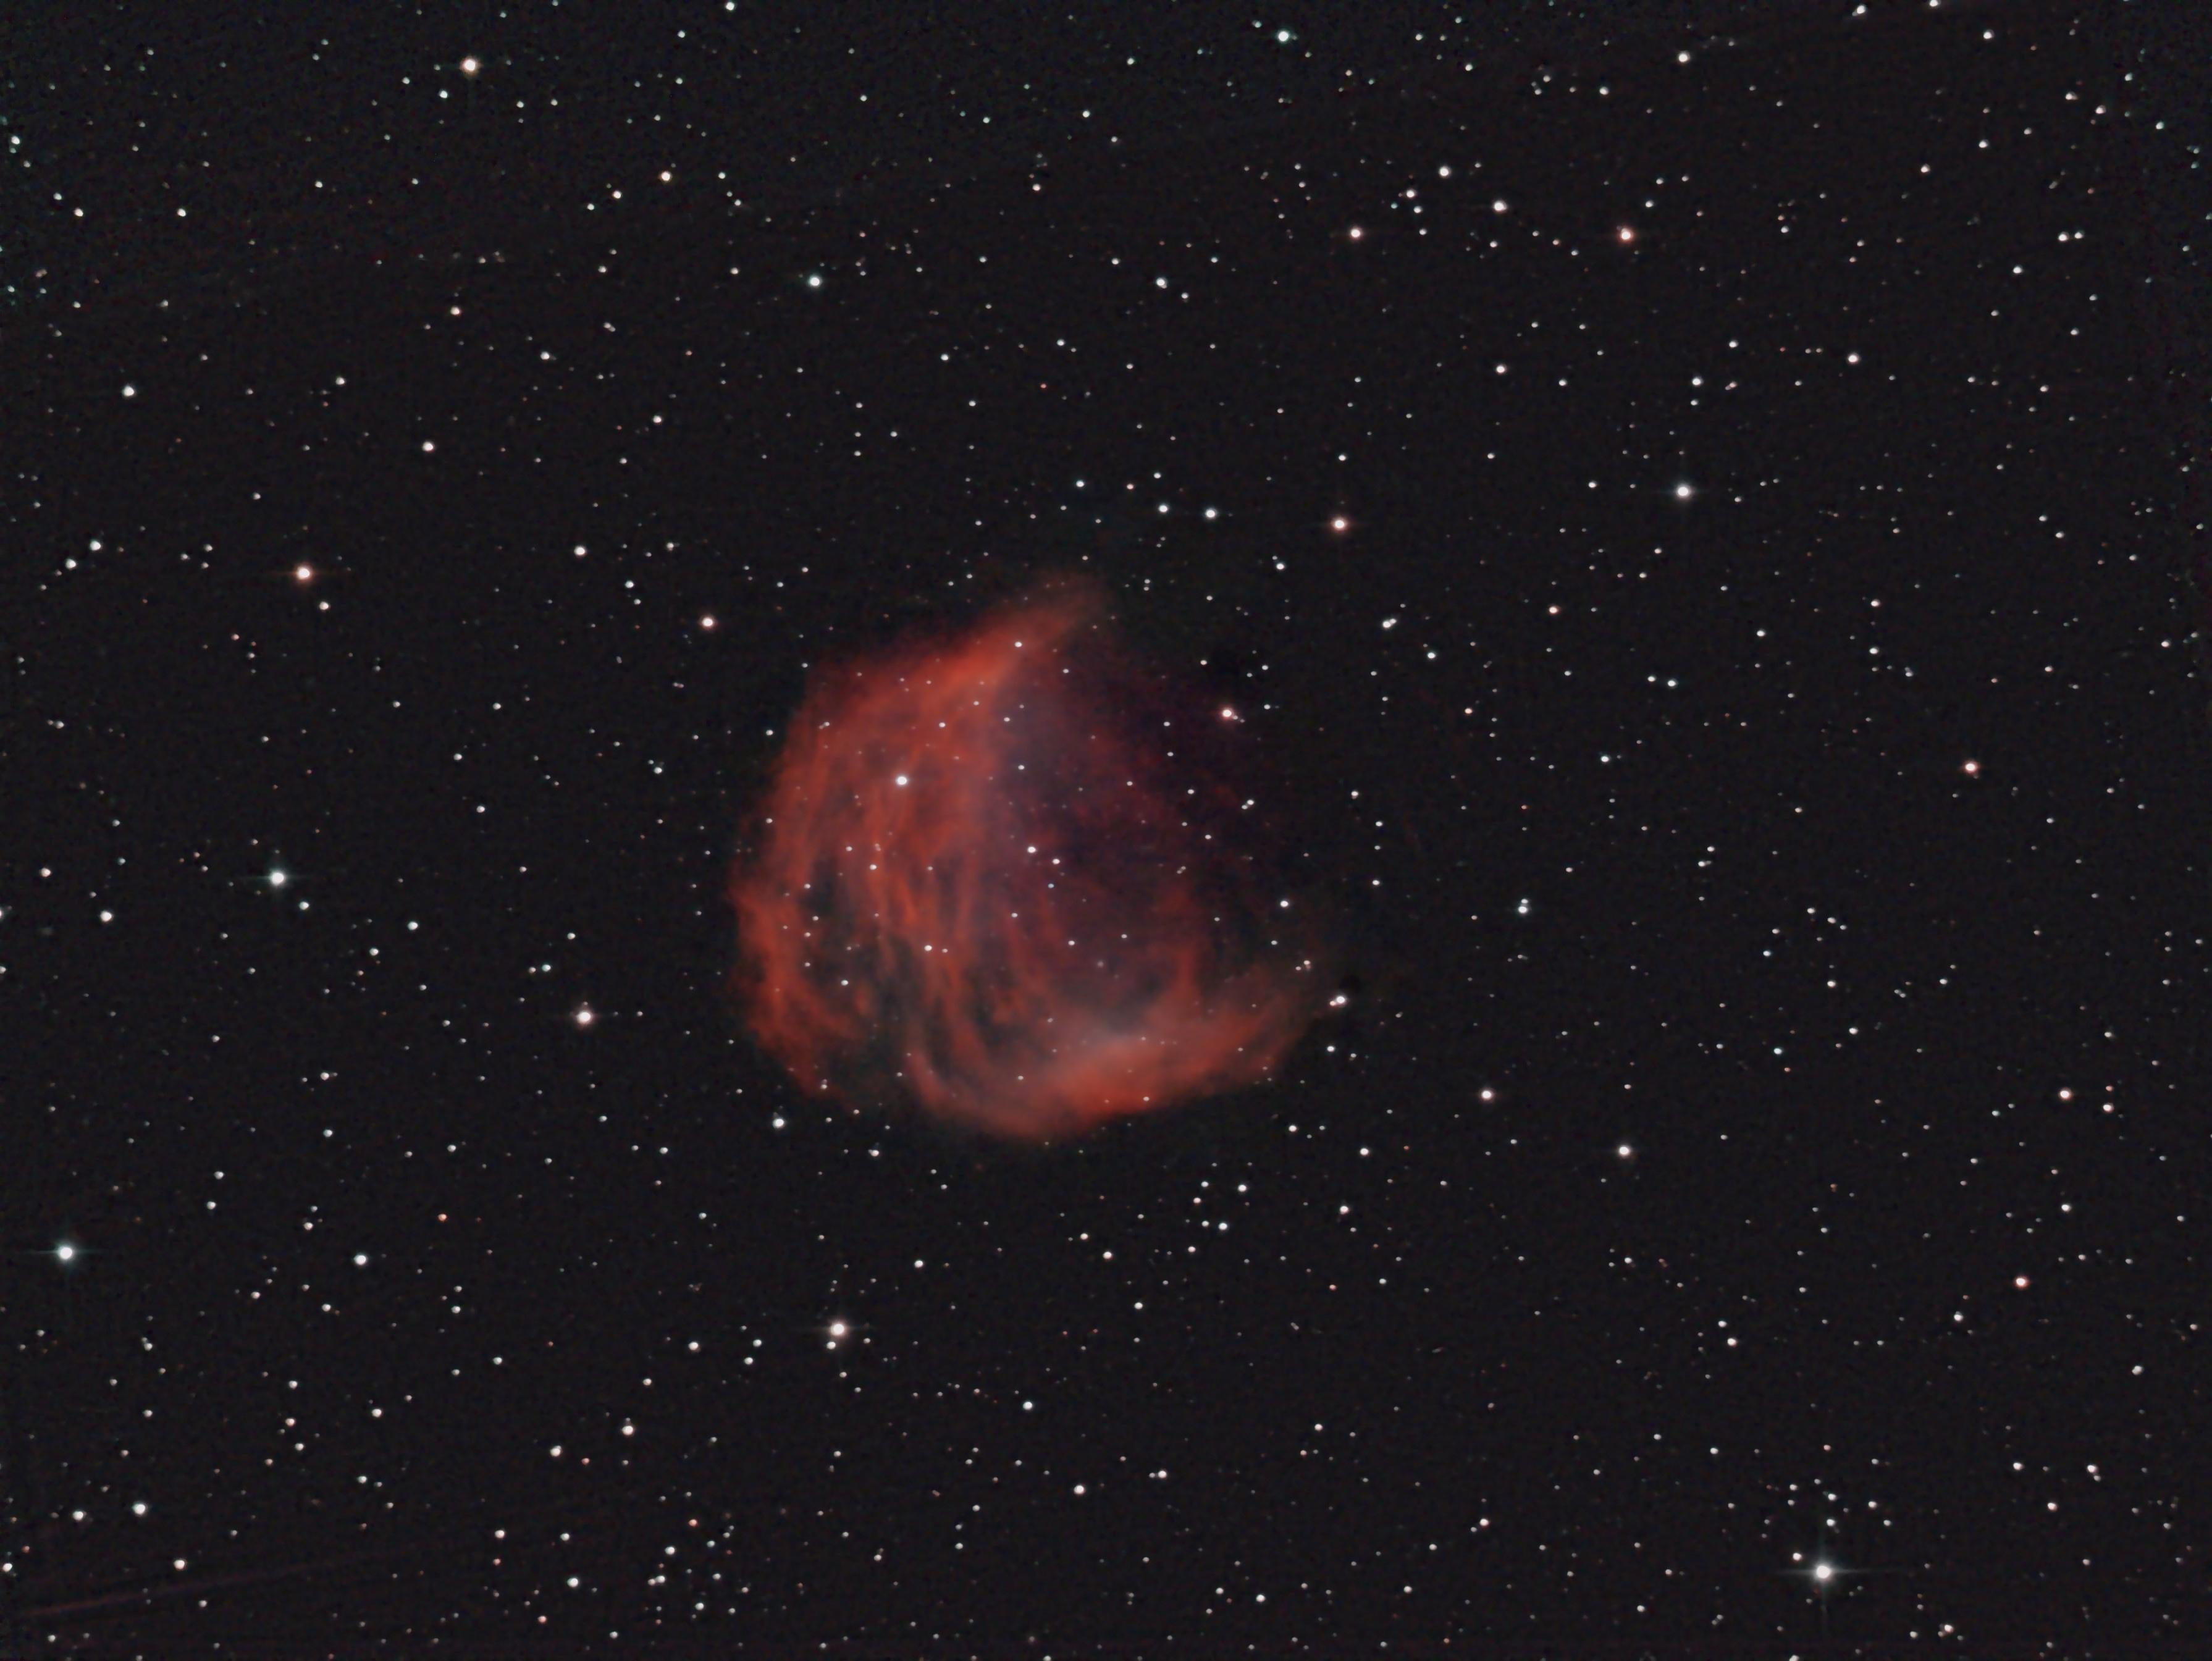 Abell21 - Sharpless 274 (Medusa Nebula)